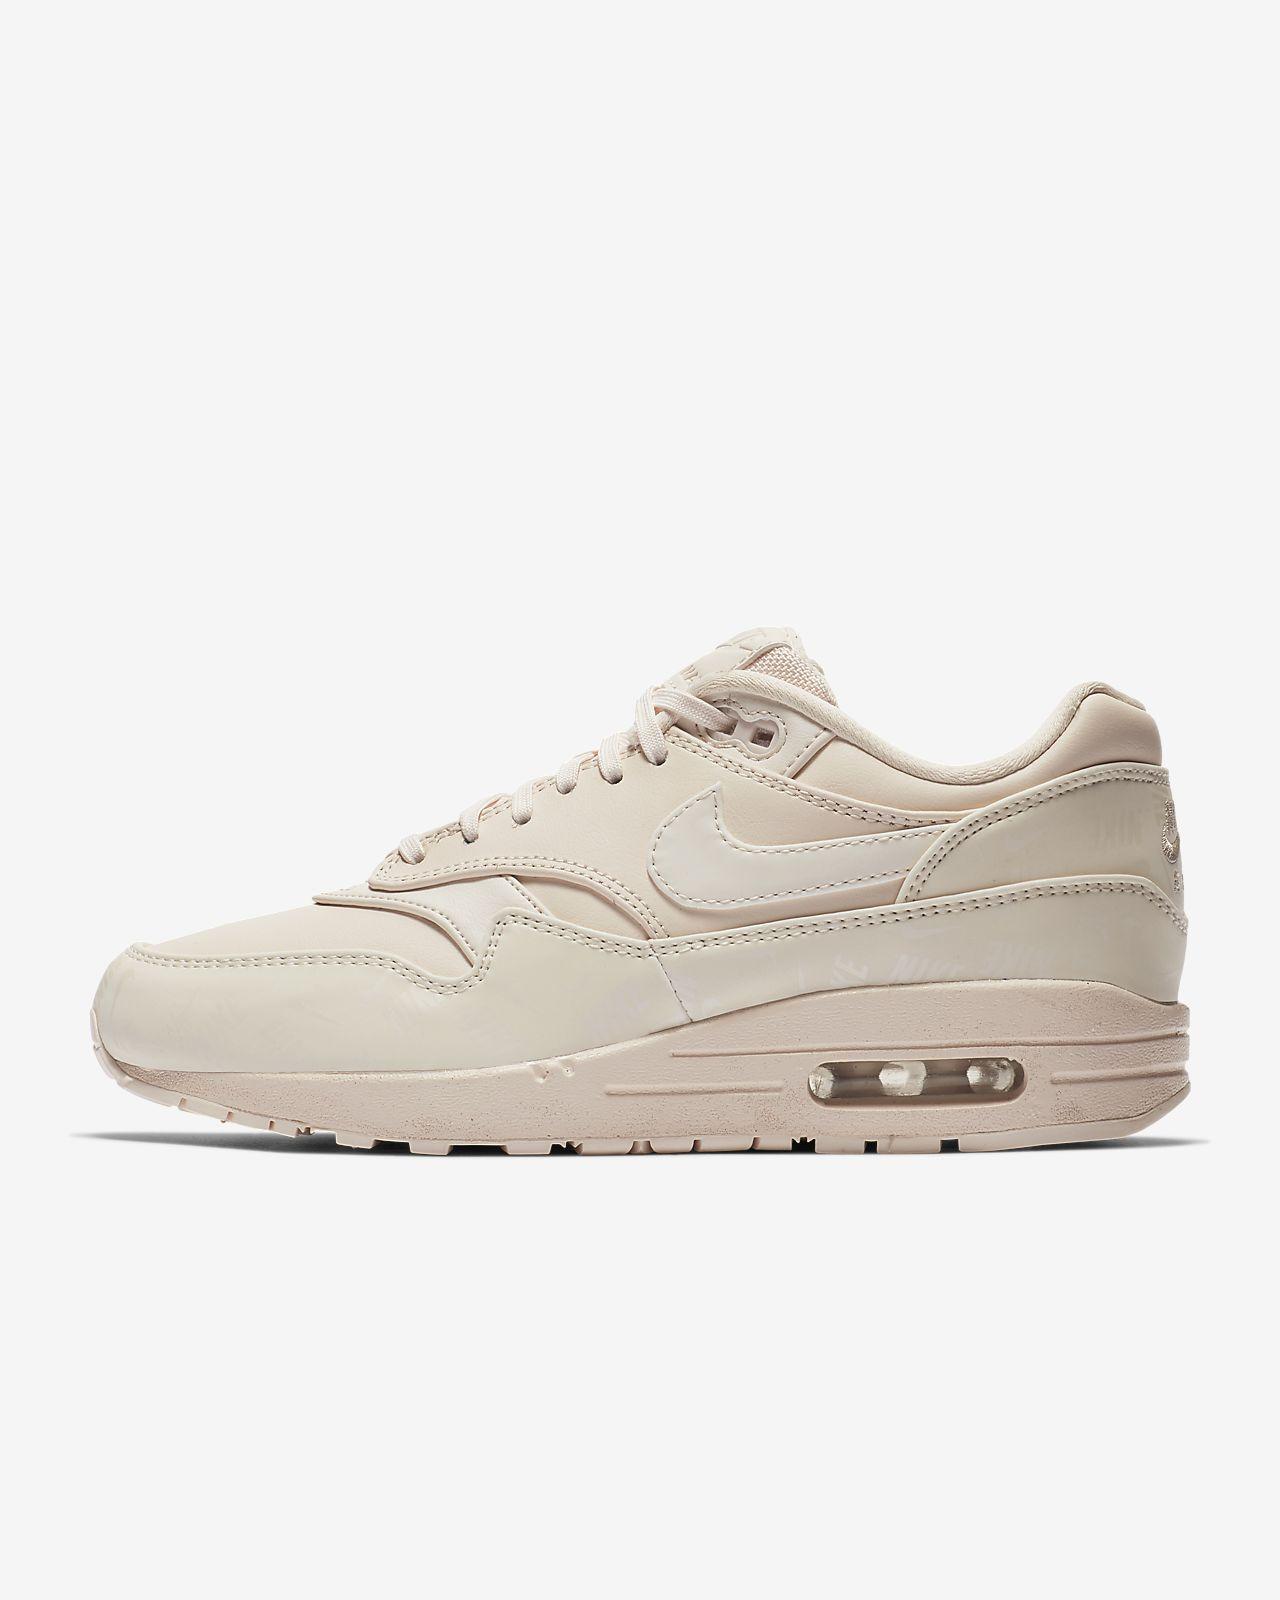 online store 7a392 fbb59 Nike Air Max 1 LX